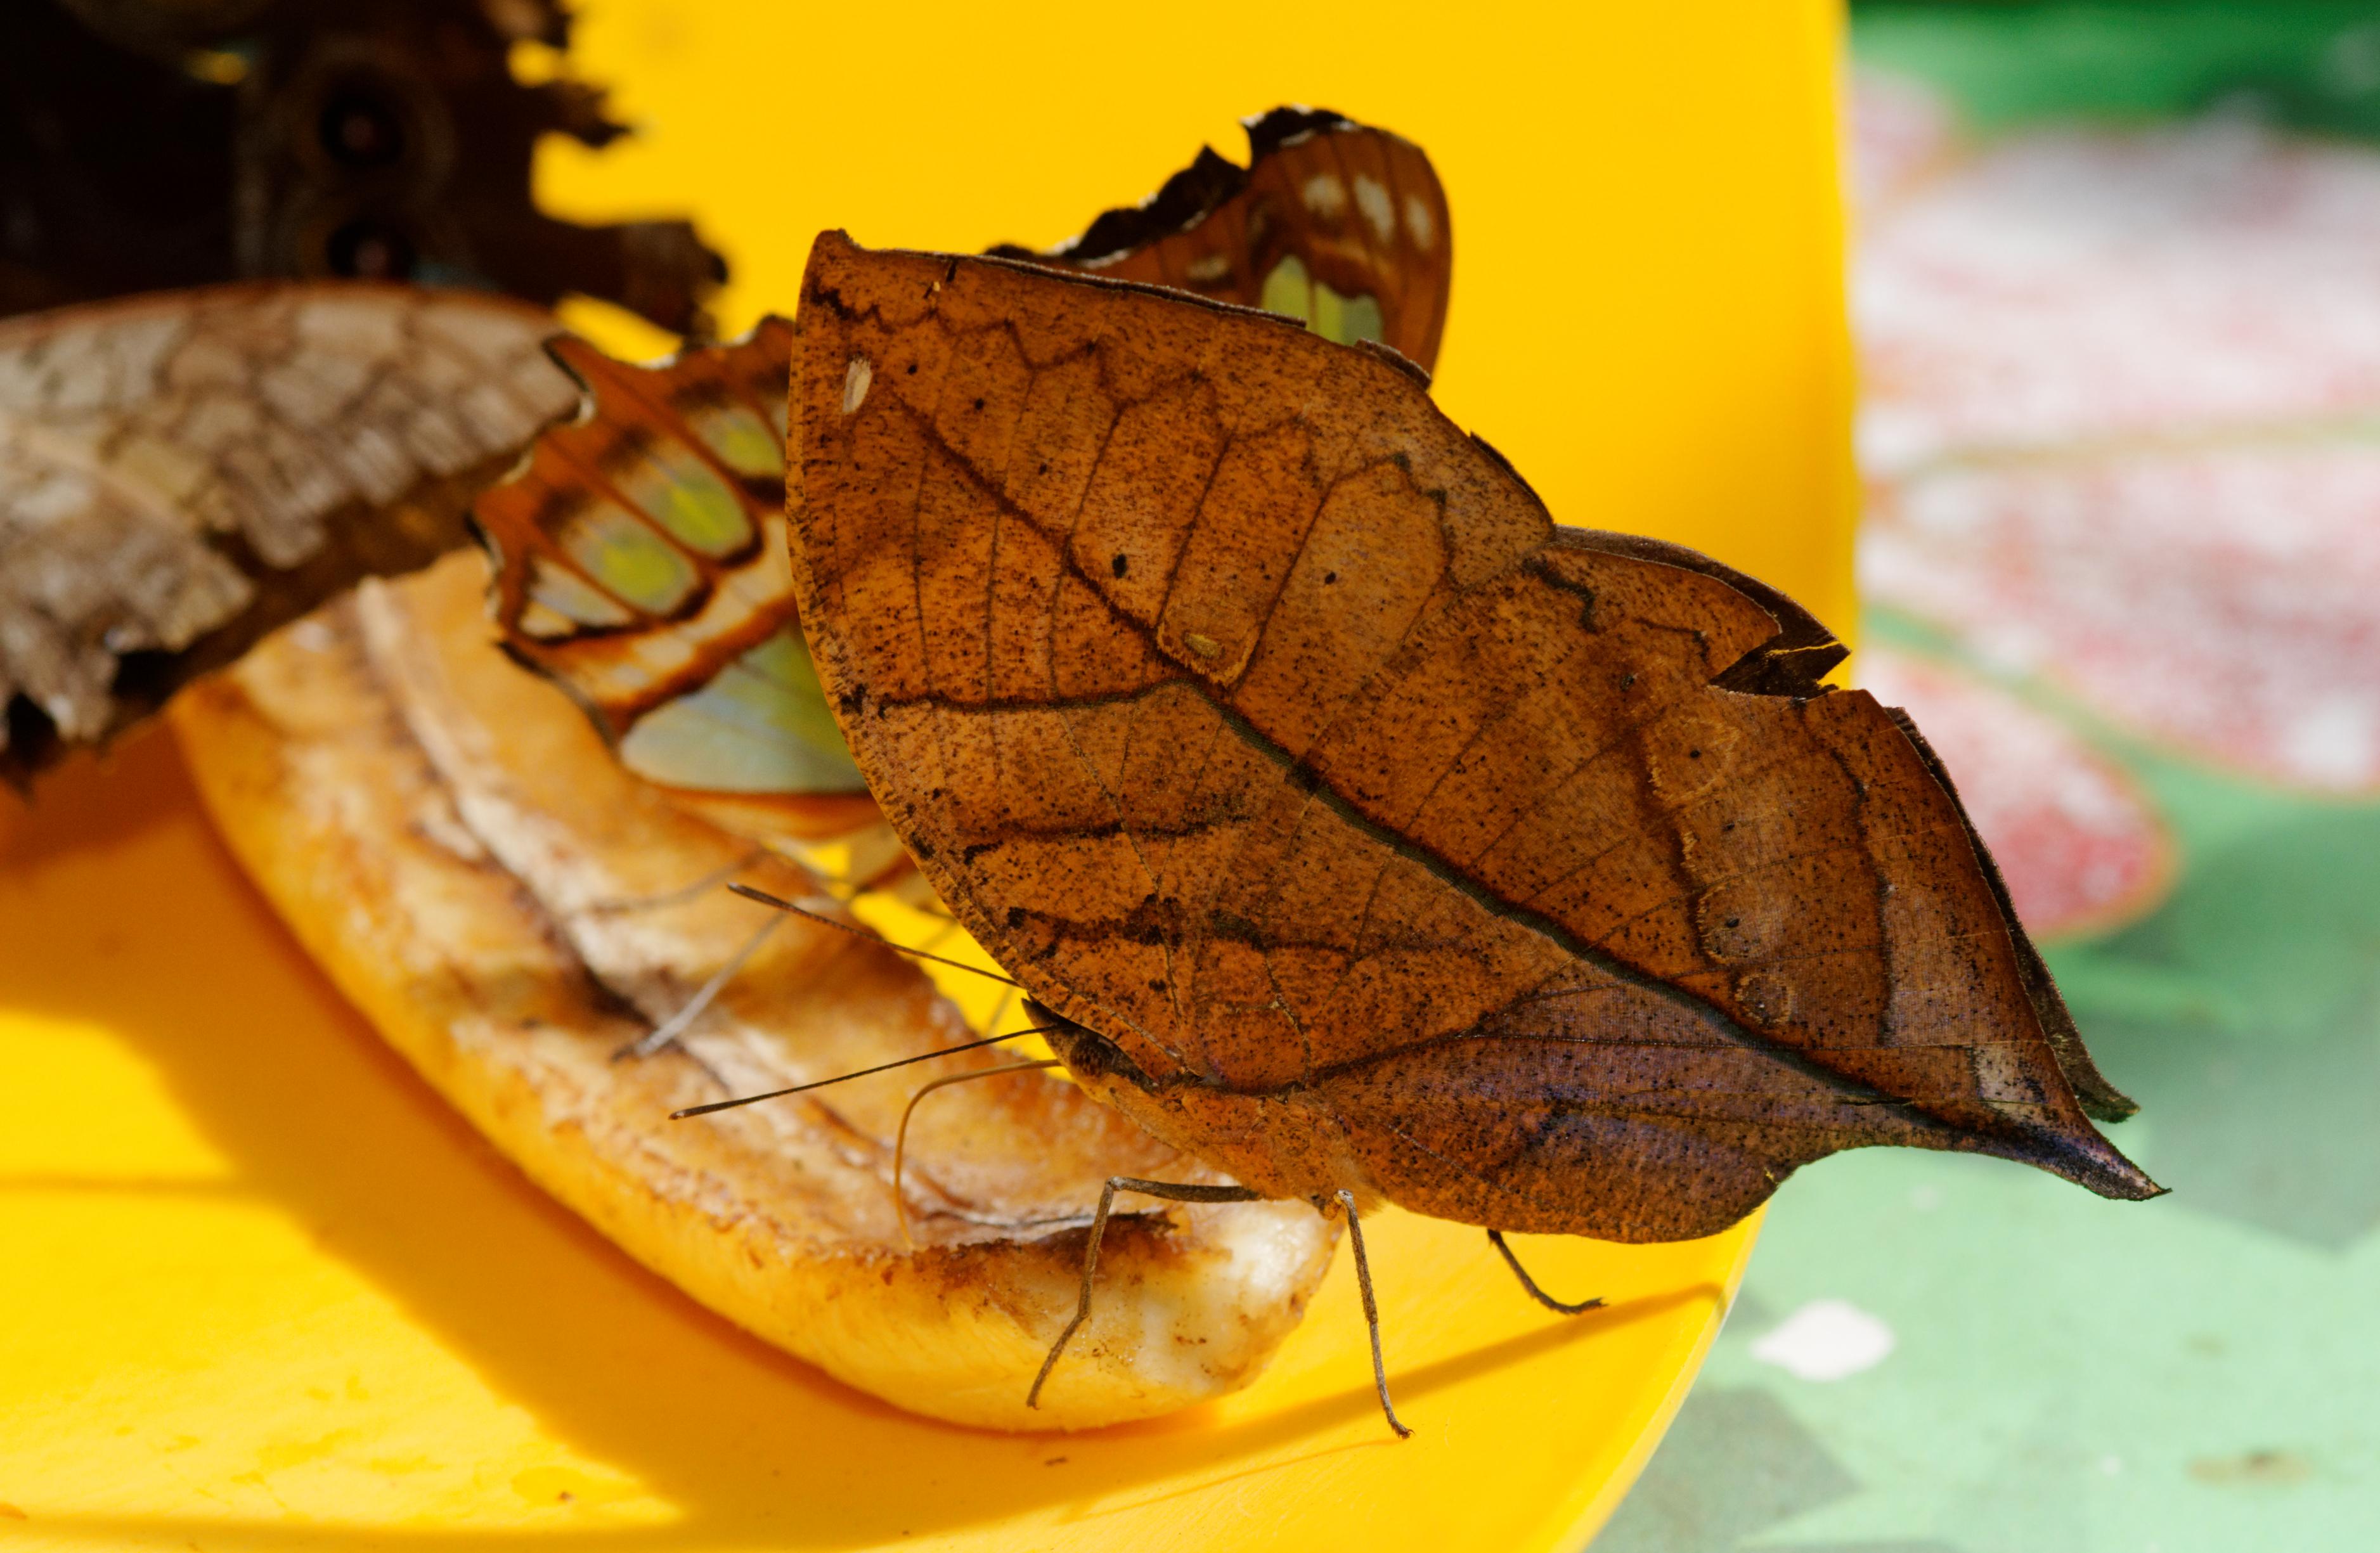 File:Indian Leaf Butterfly (Kallima Paralekta) Feeding On